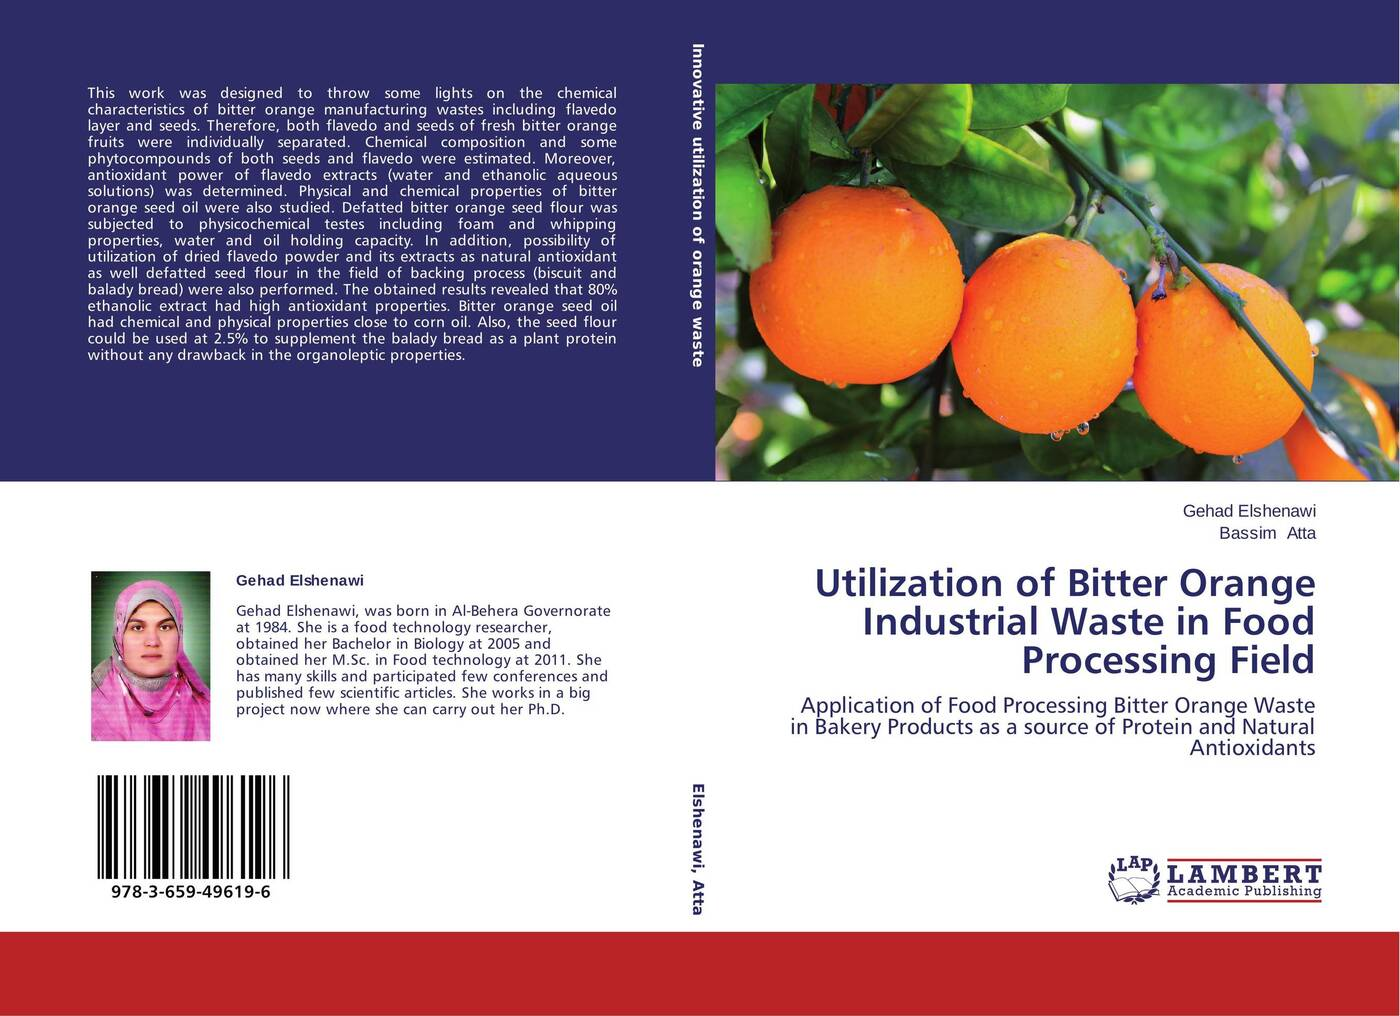 Gehad Elshenawi and Bassim Atta Utilization of Bitter Orange Industrial Waste in Food Processing Field waya phutdhawong melissa agustin and weerachai phutdhawong utilization of palm oil mill wastes